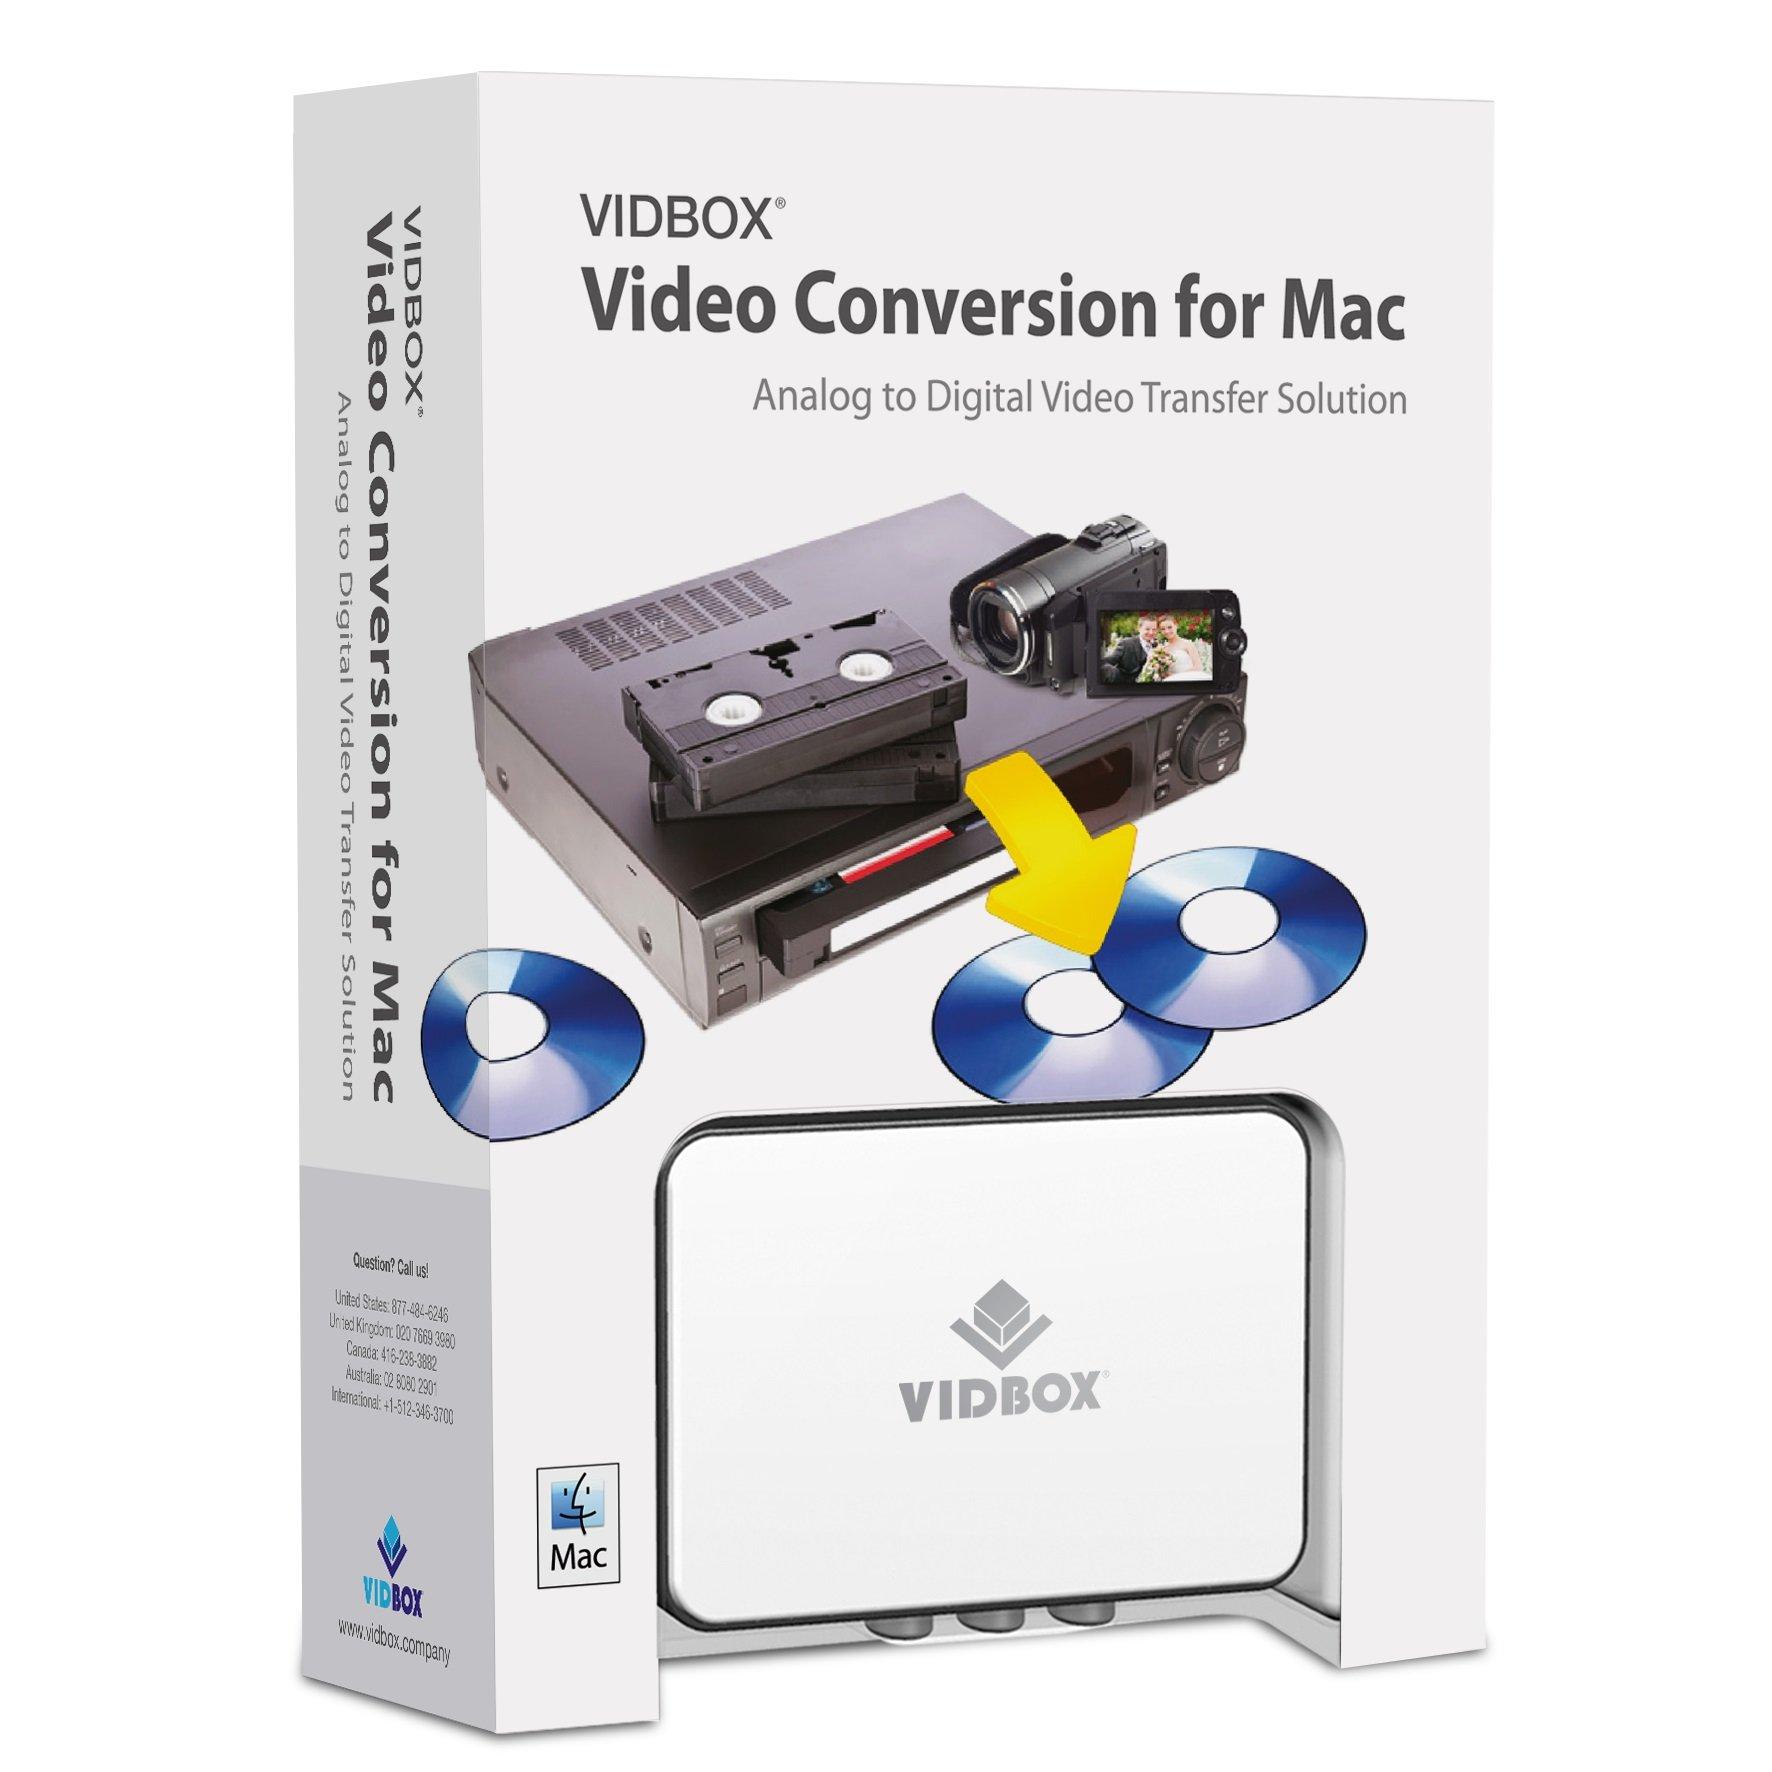 VIDBOX Video Conversion for Mac by VIDBOX